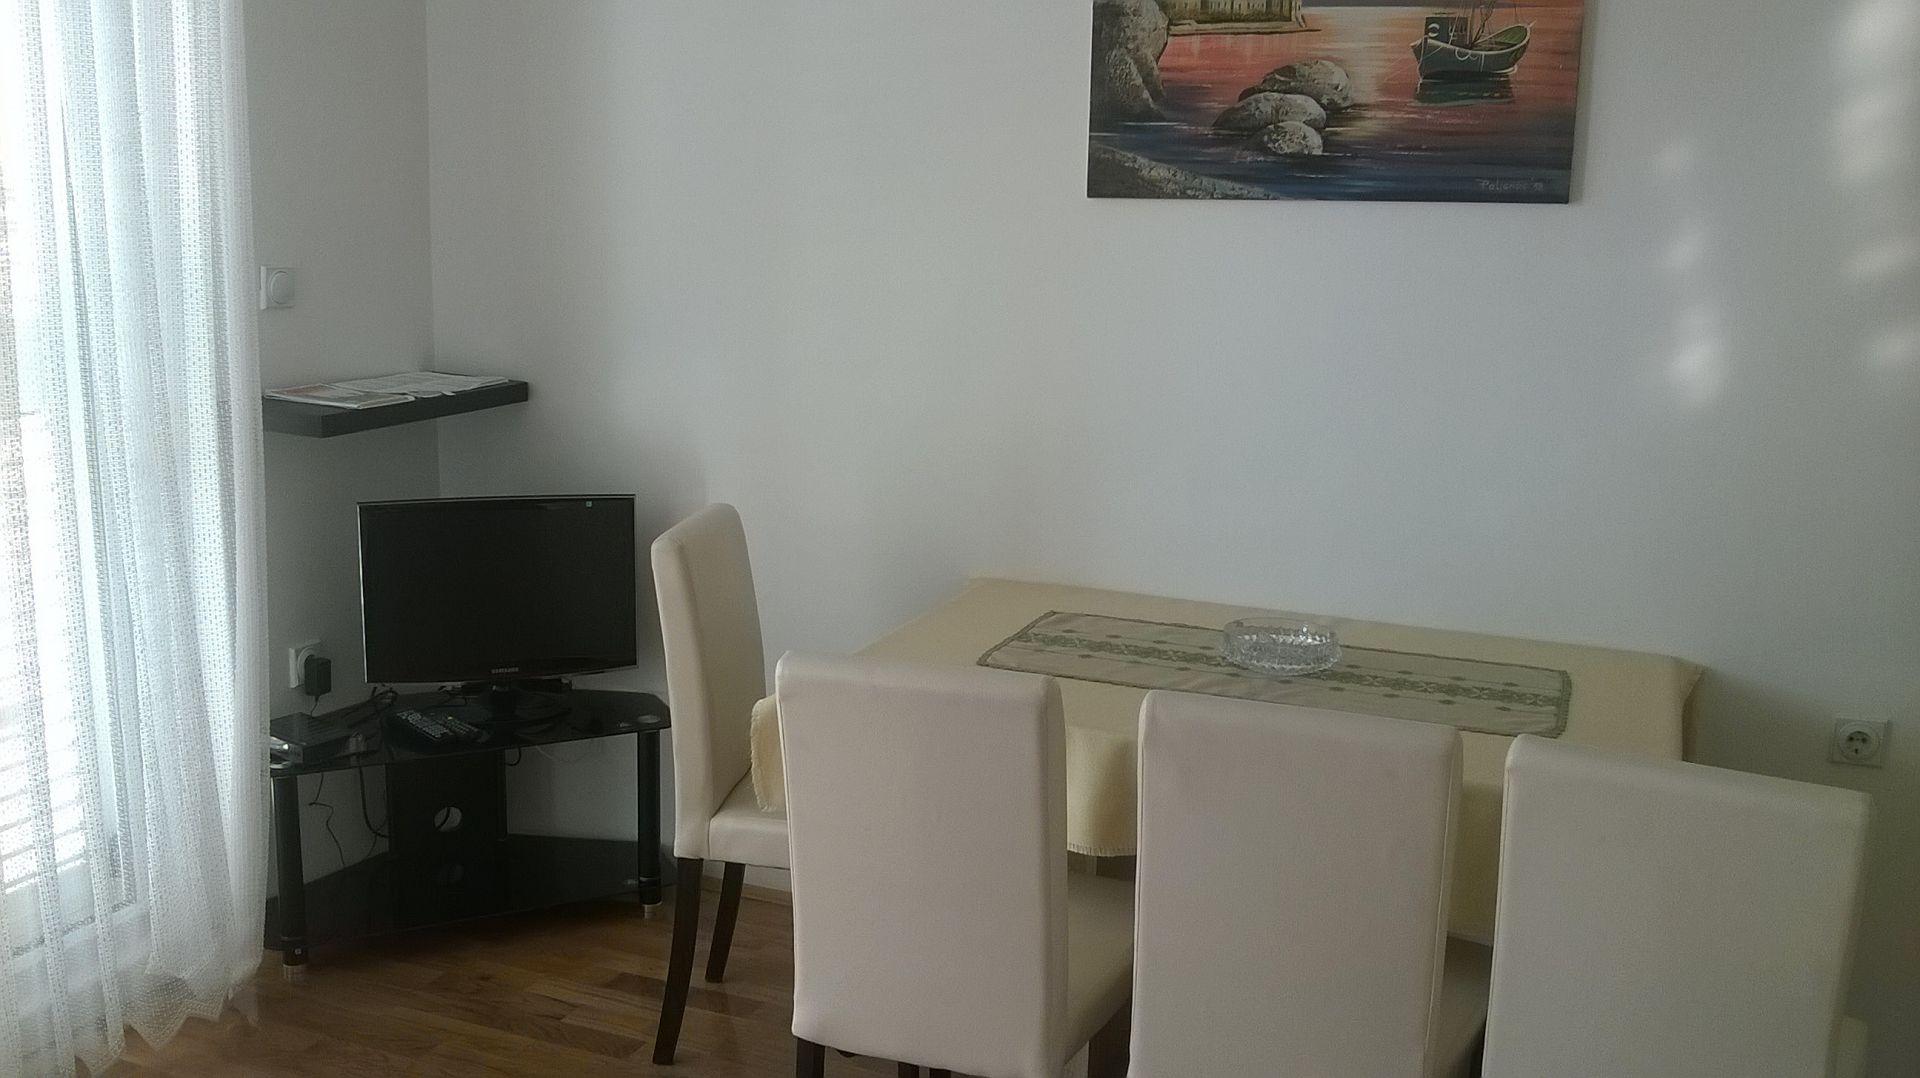 Apartamente Apartment MK A5 Banjol, Island Rab 50476, Banjol, Rab, Regiunea Primorje-Gorski Kotar